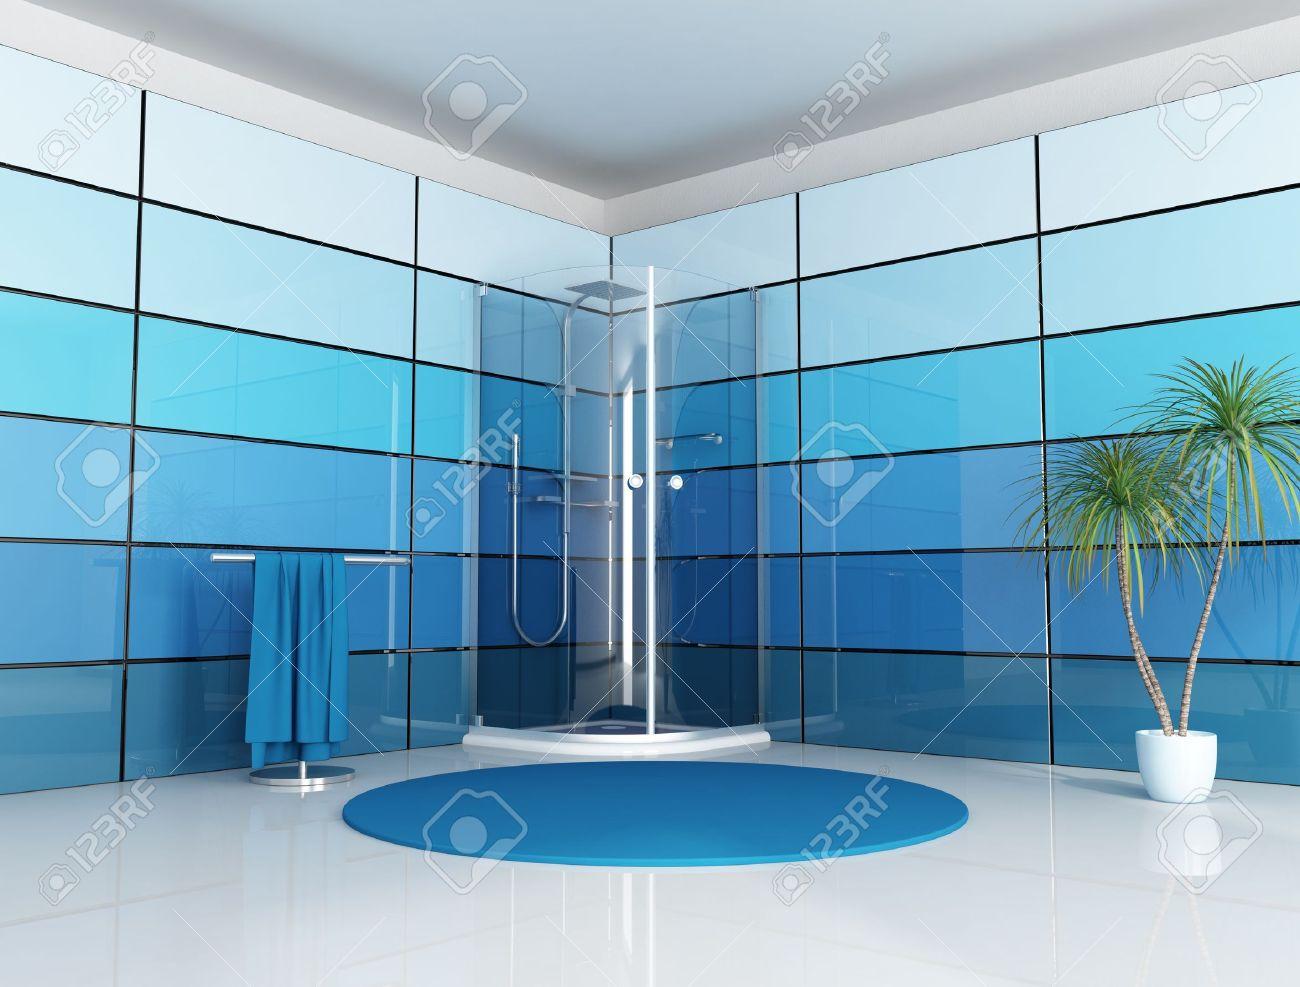 salle douche moderne salle de bain moderne avec cabine douche et panneau bleu rendu - Salle De Bain Douche Moderne